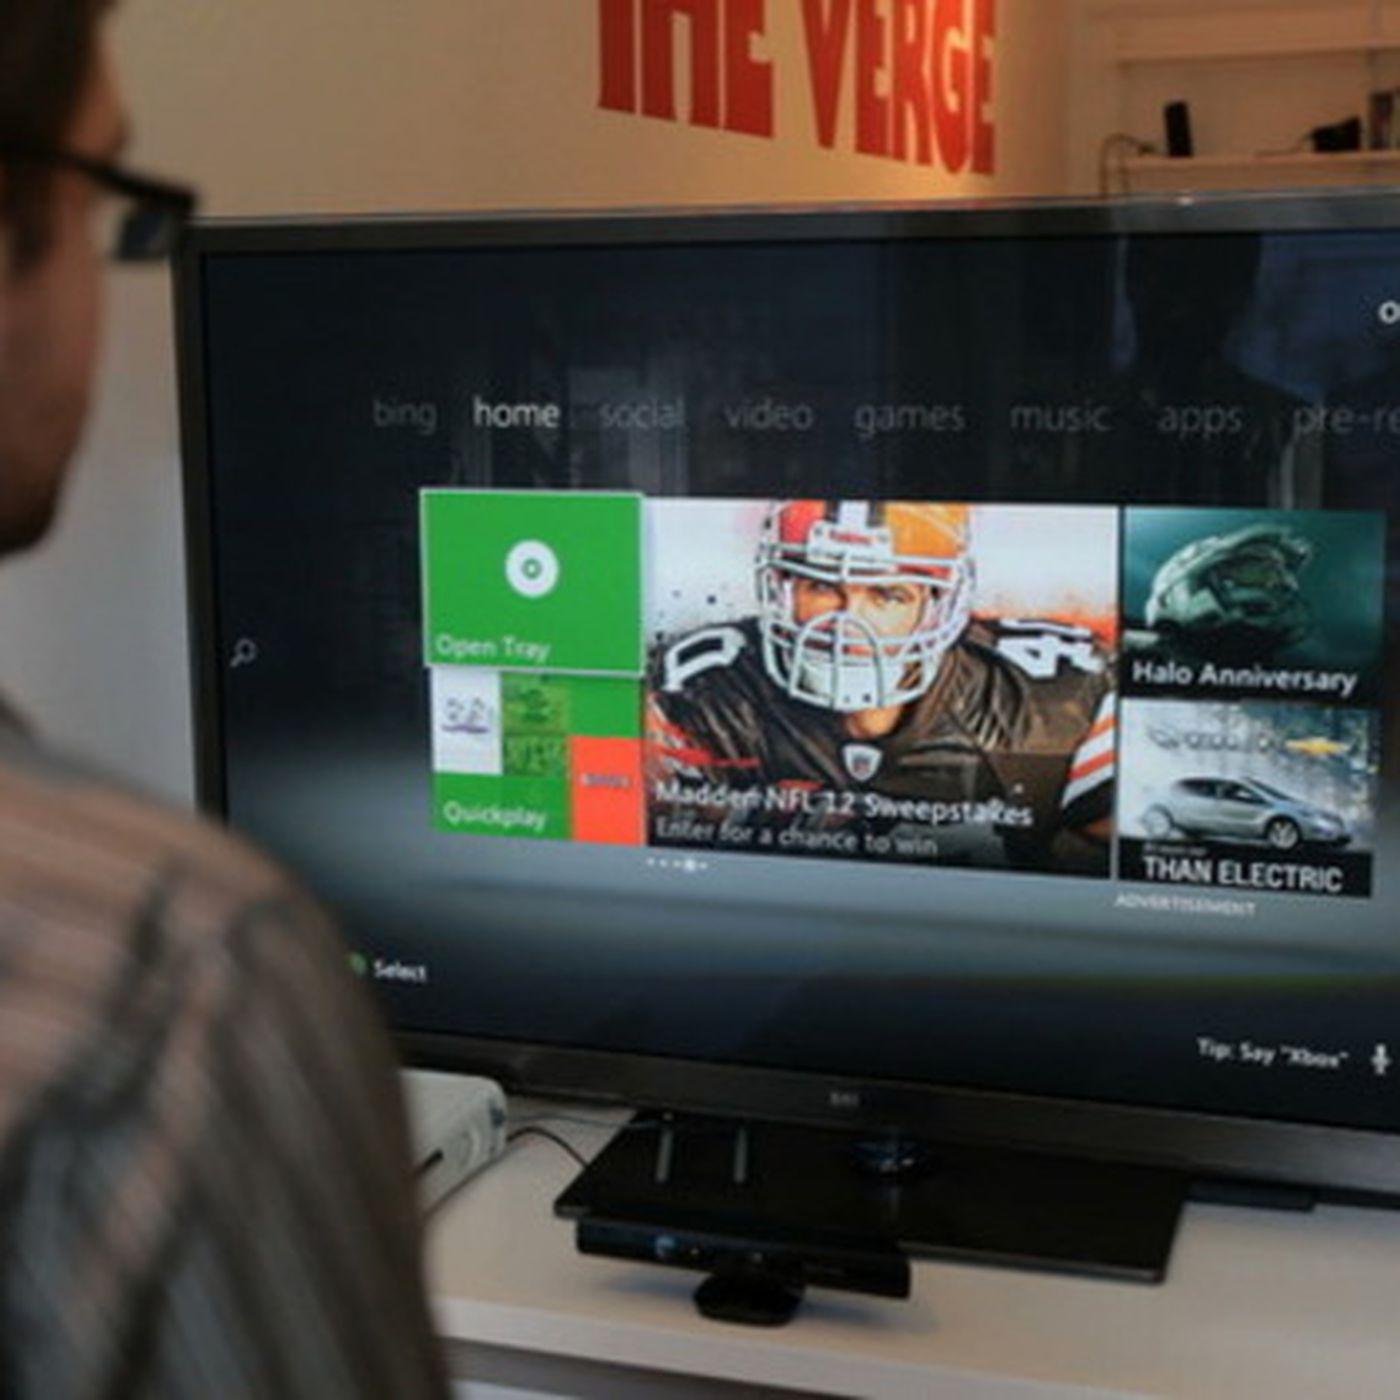 Microsoft seeking TV exec to develop original Xbox